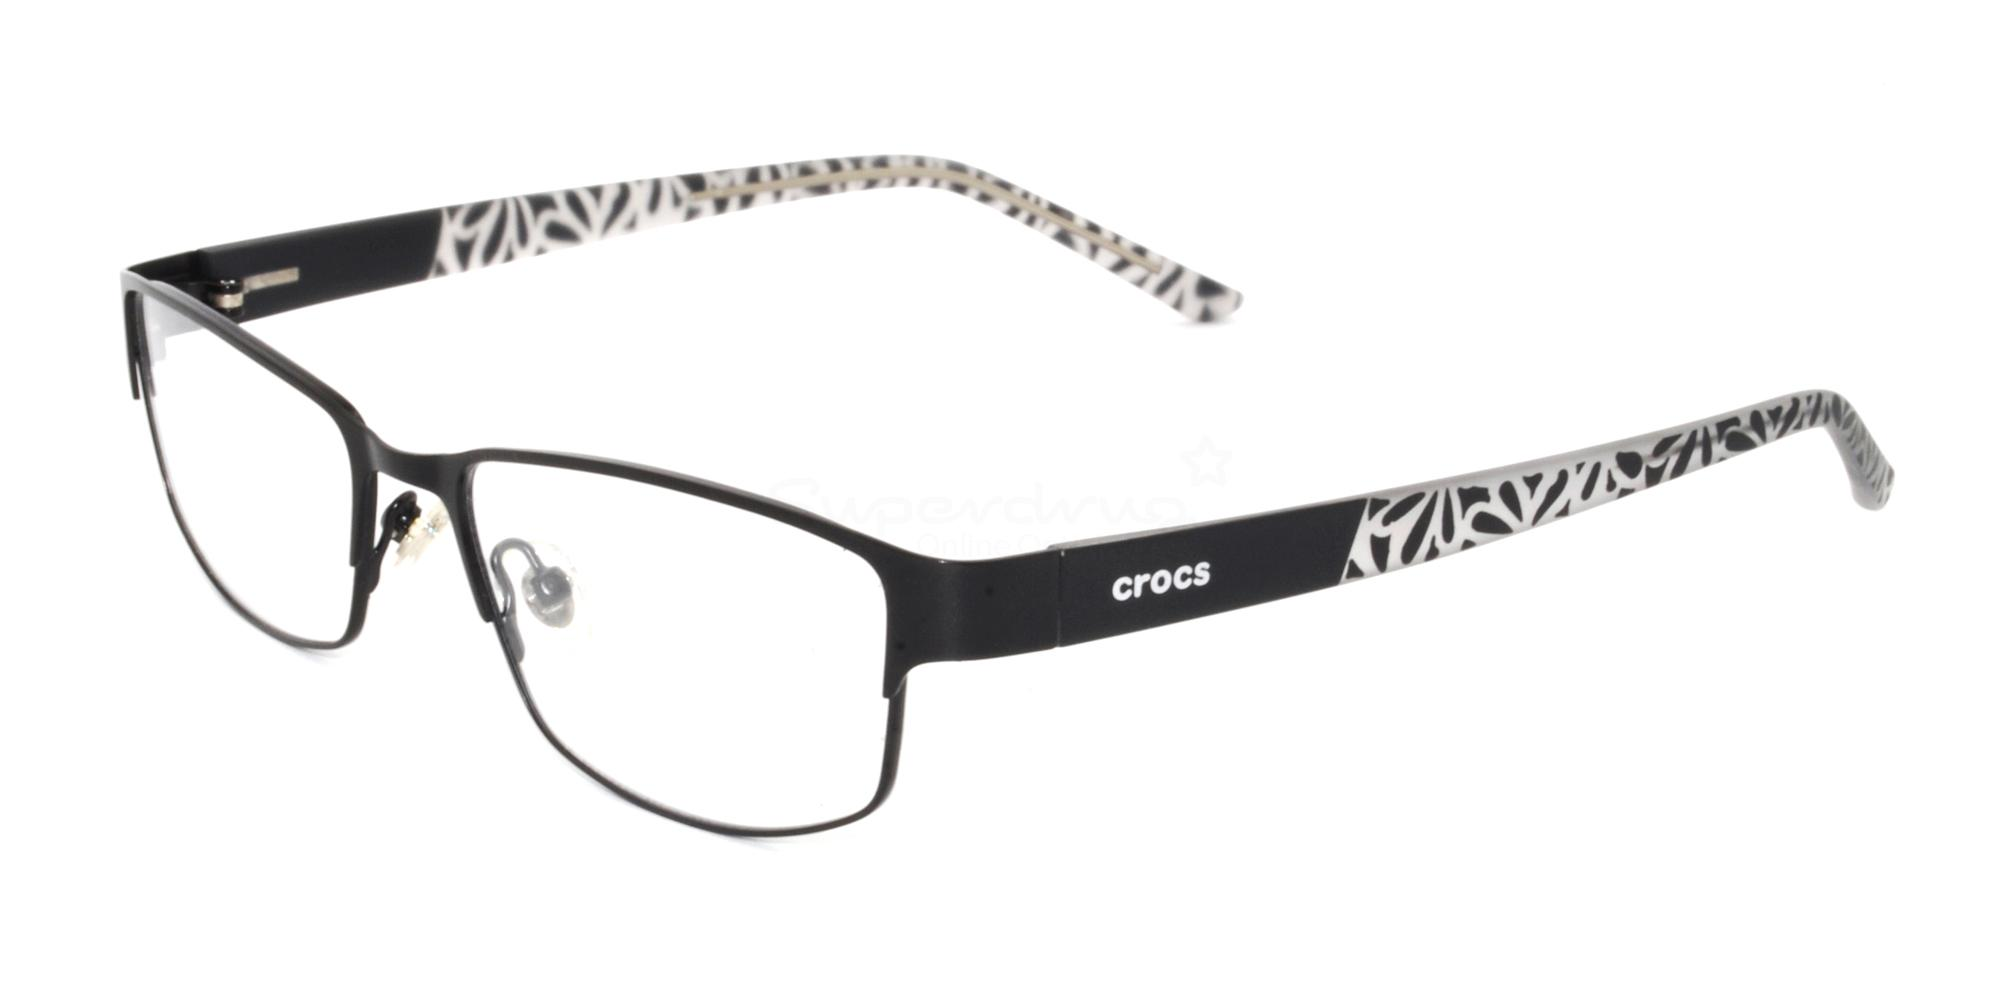 20GY CF4010 Glasses, Crocs Eyewear